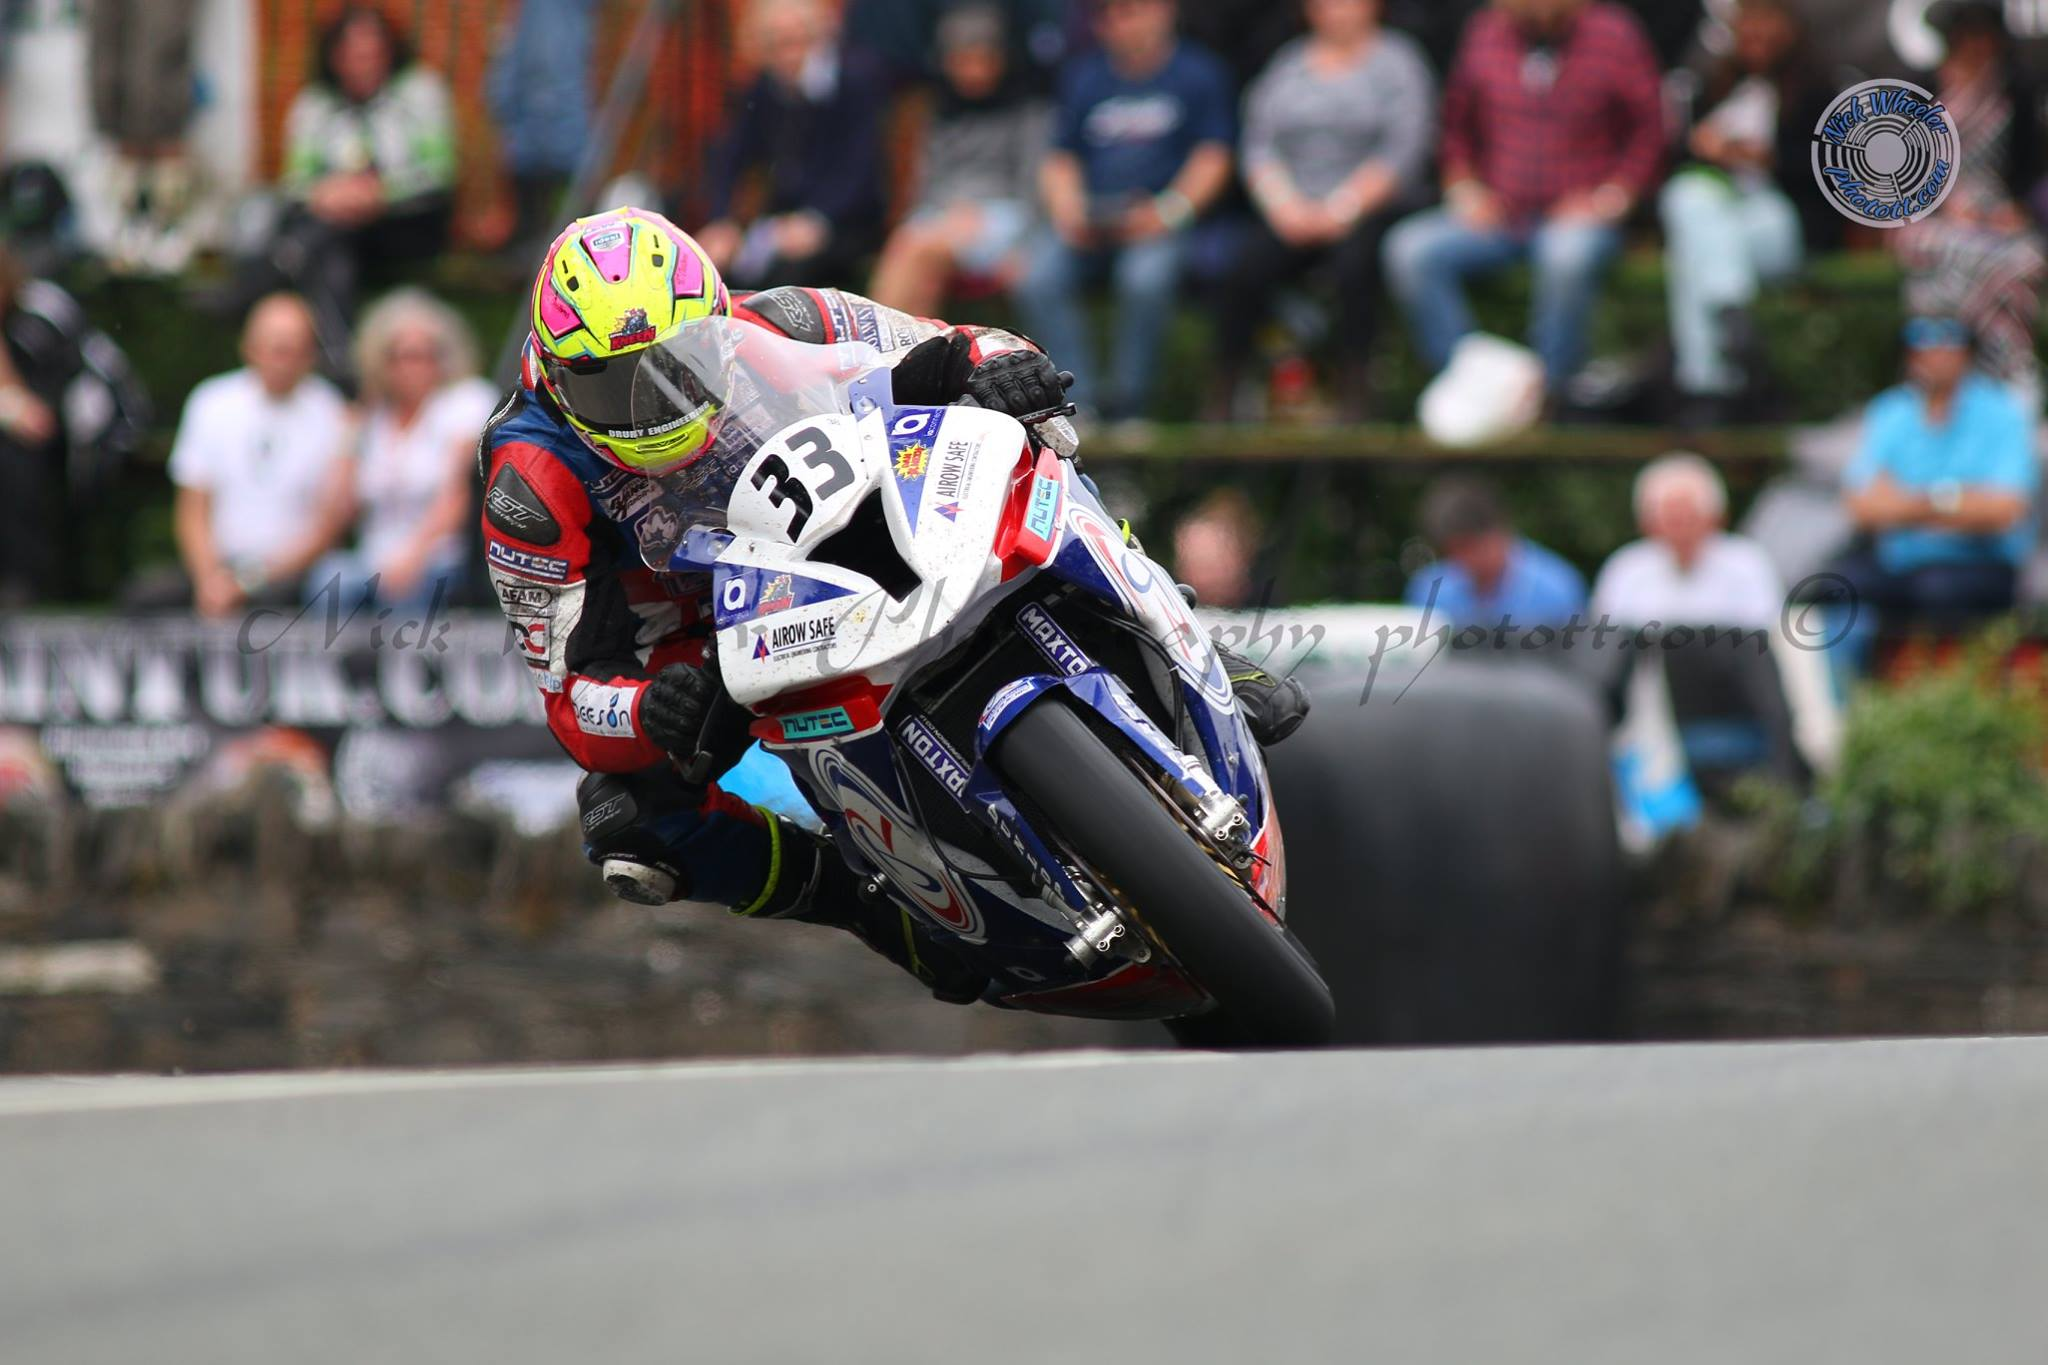 TT 2018: Craig Neve Talks Superbike Action, Tomorrow's Races, Mountain Course Progress